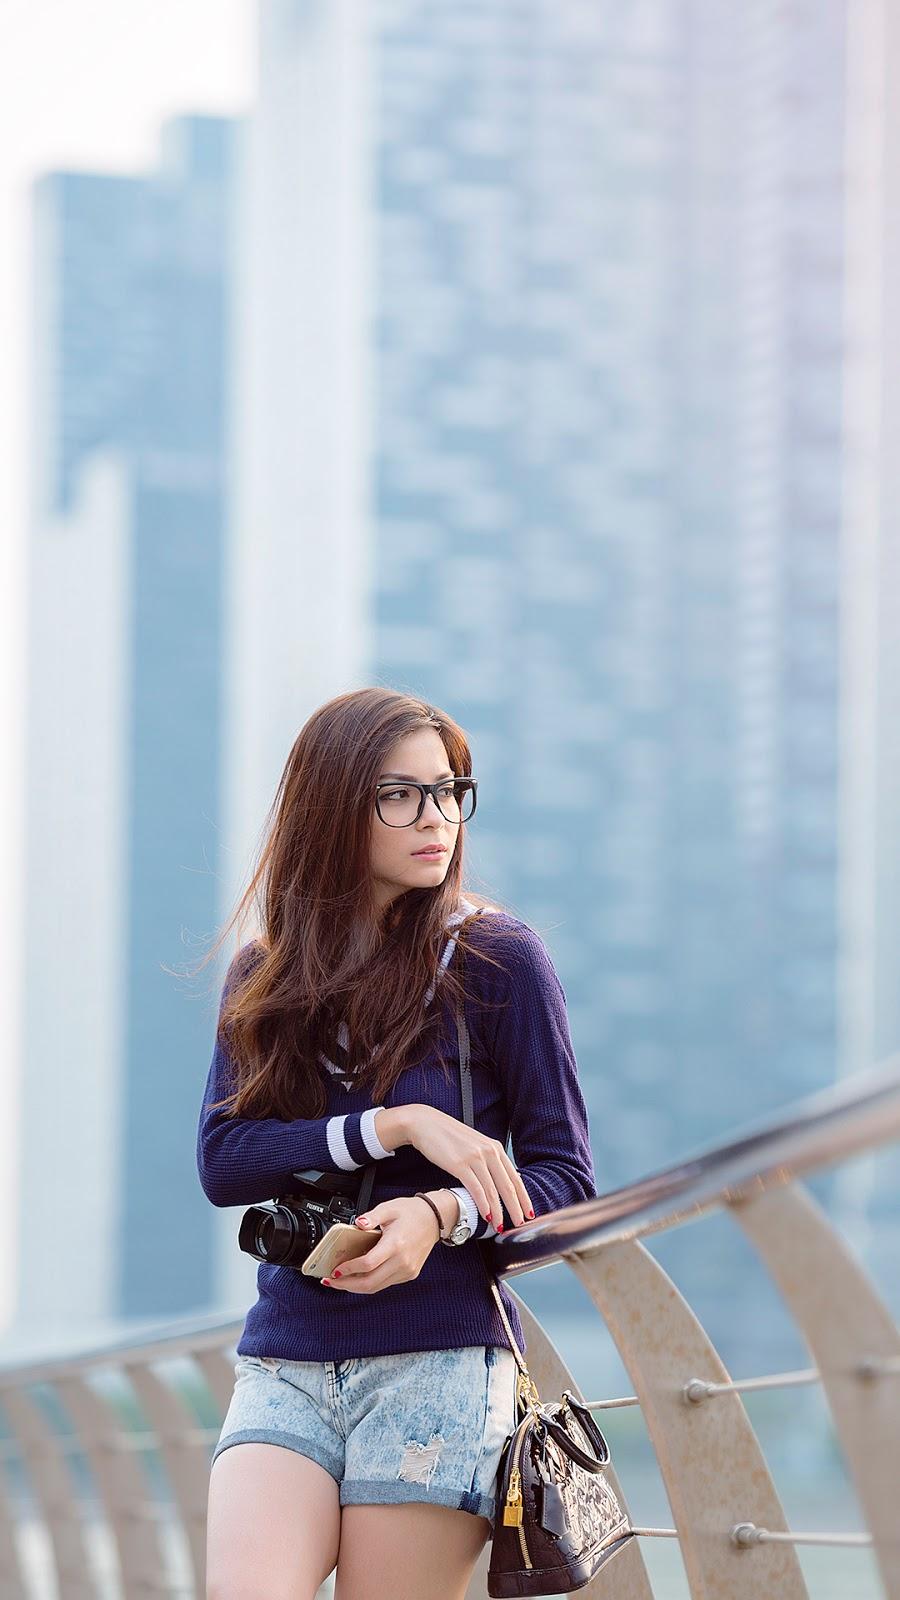 Wallpaper HD Presenter Seksi Sandra Olga cewek manis pakai kacamata indah